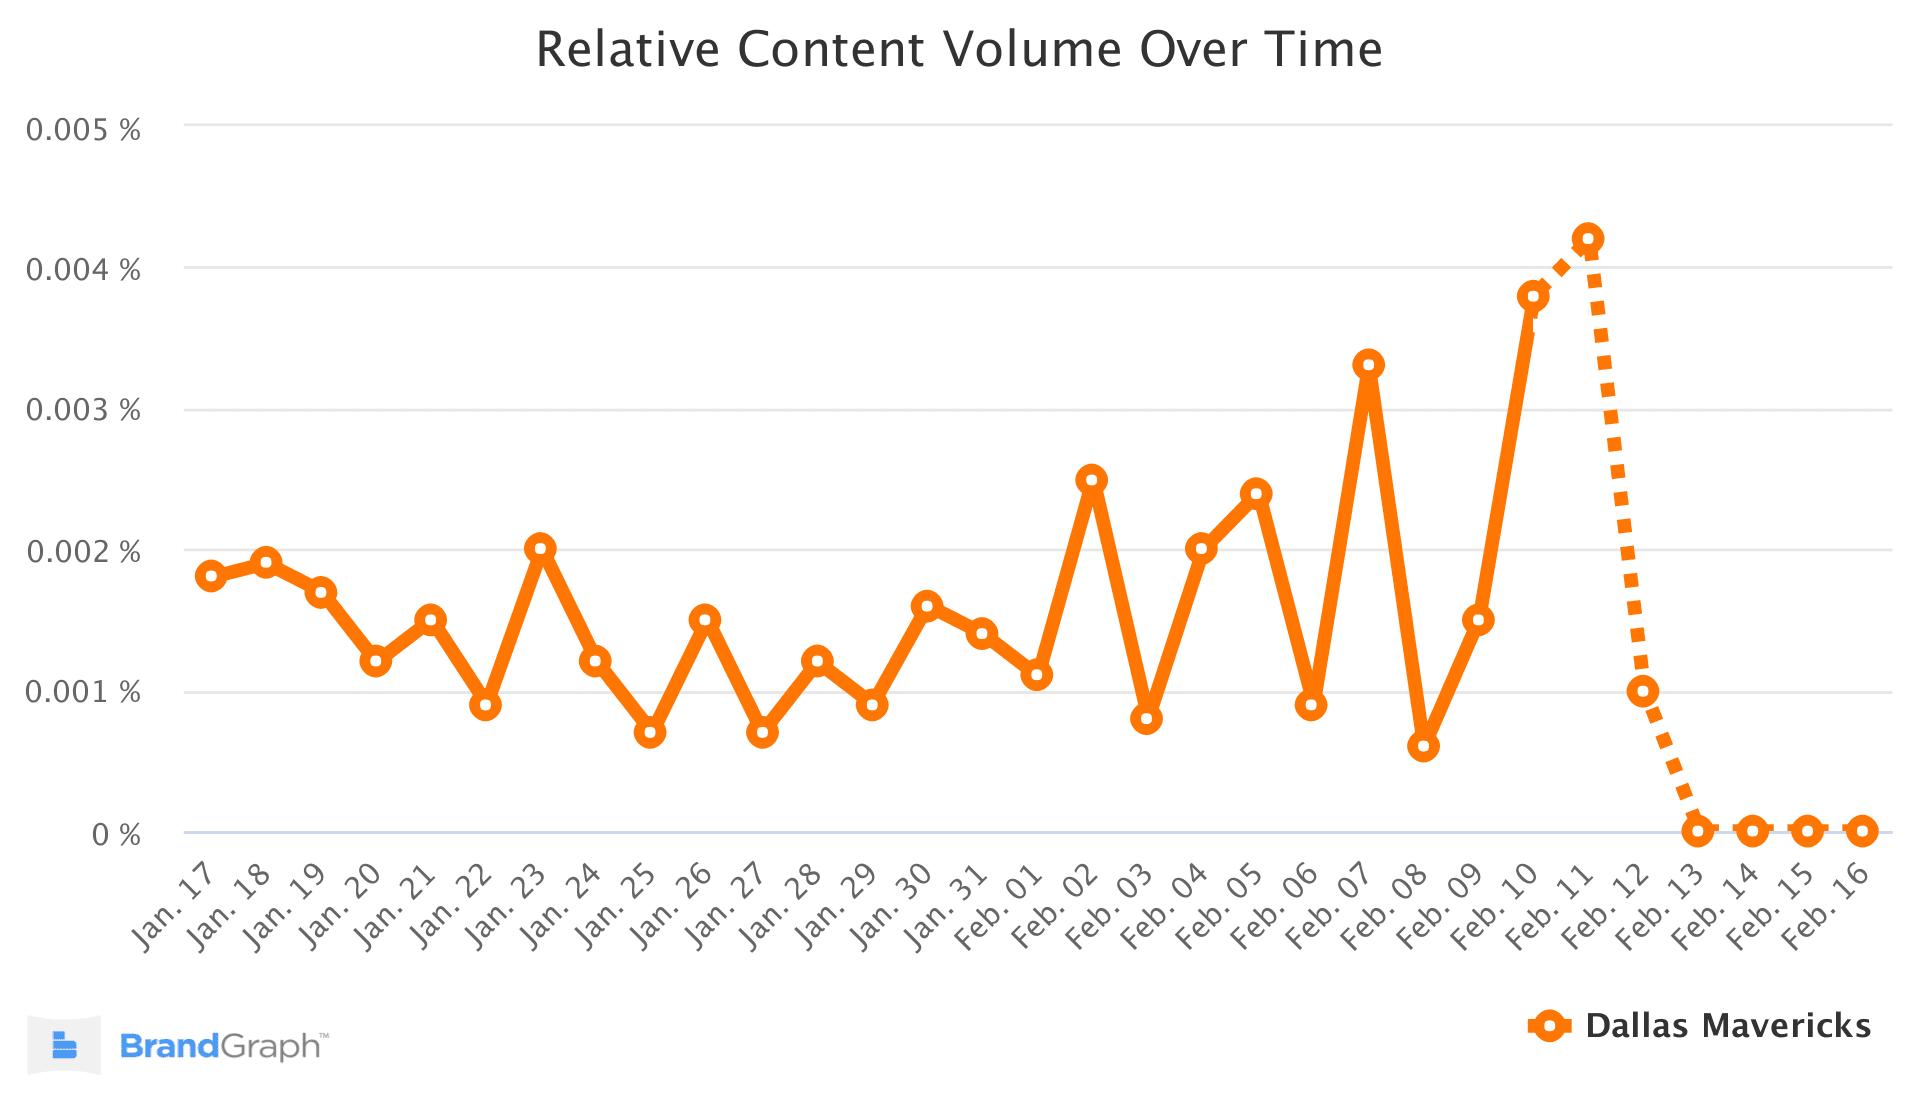 dallsmavericks-brandgraph-trend